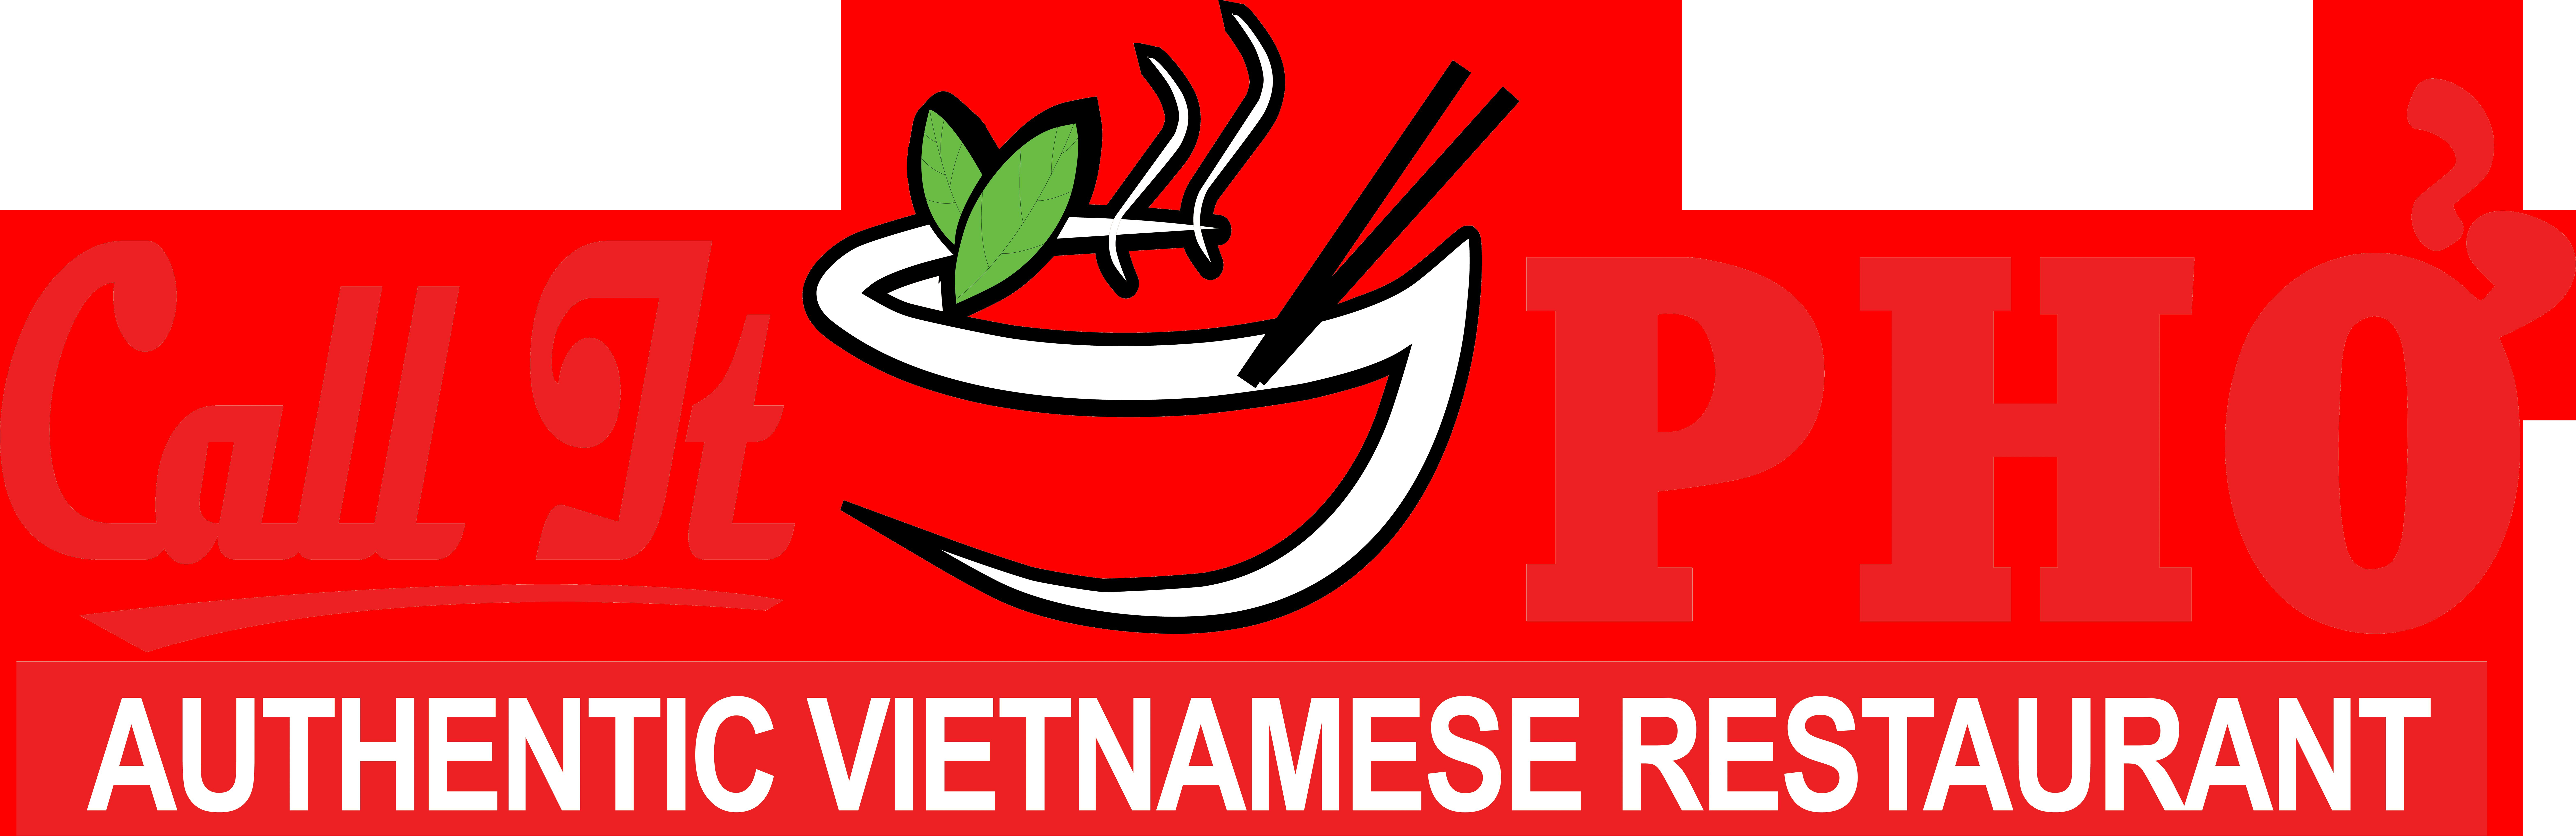 Vietnamese Restaurant, Pho, Spring Roll | Clarksville TN